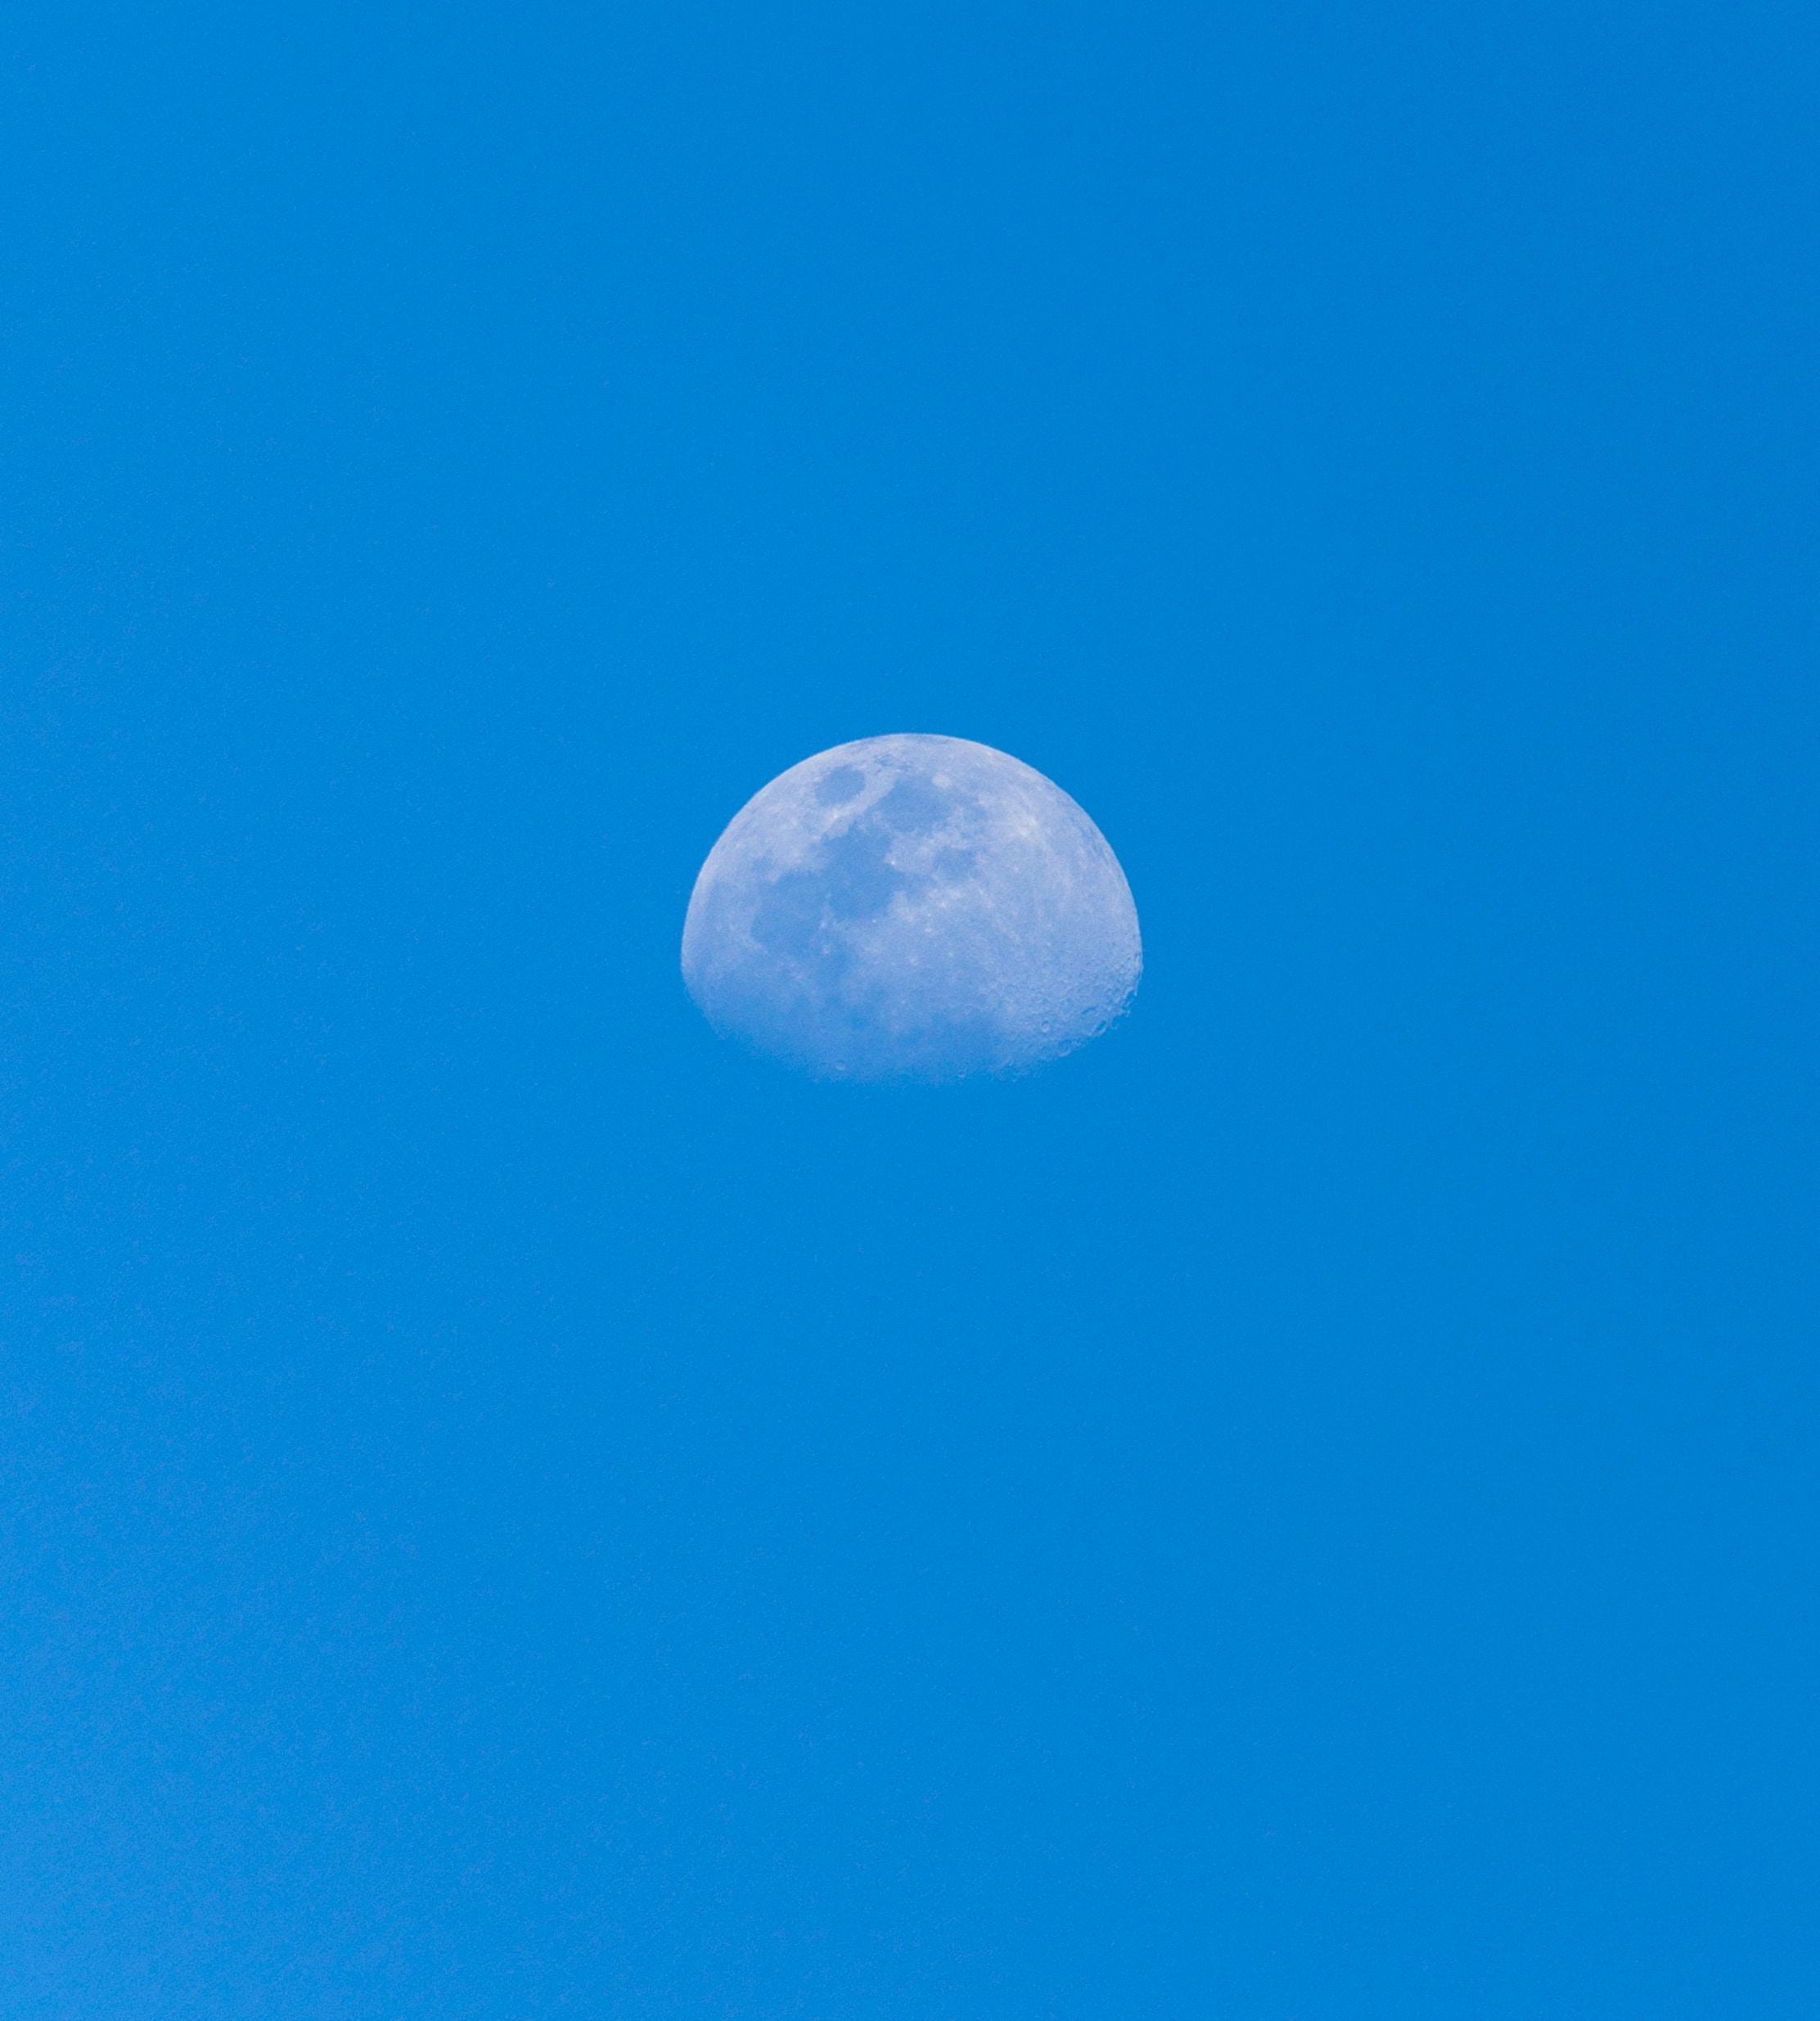 landscape photograph of moon